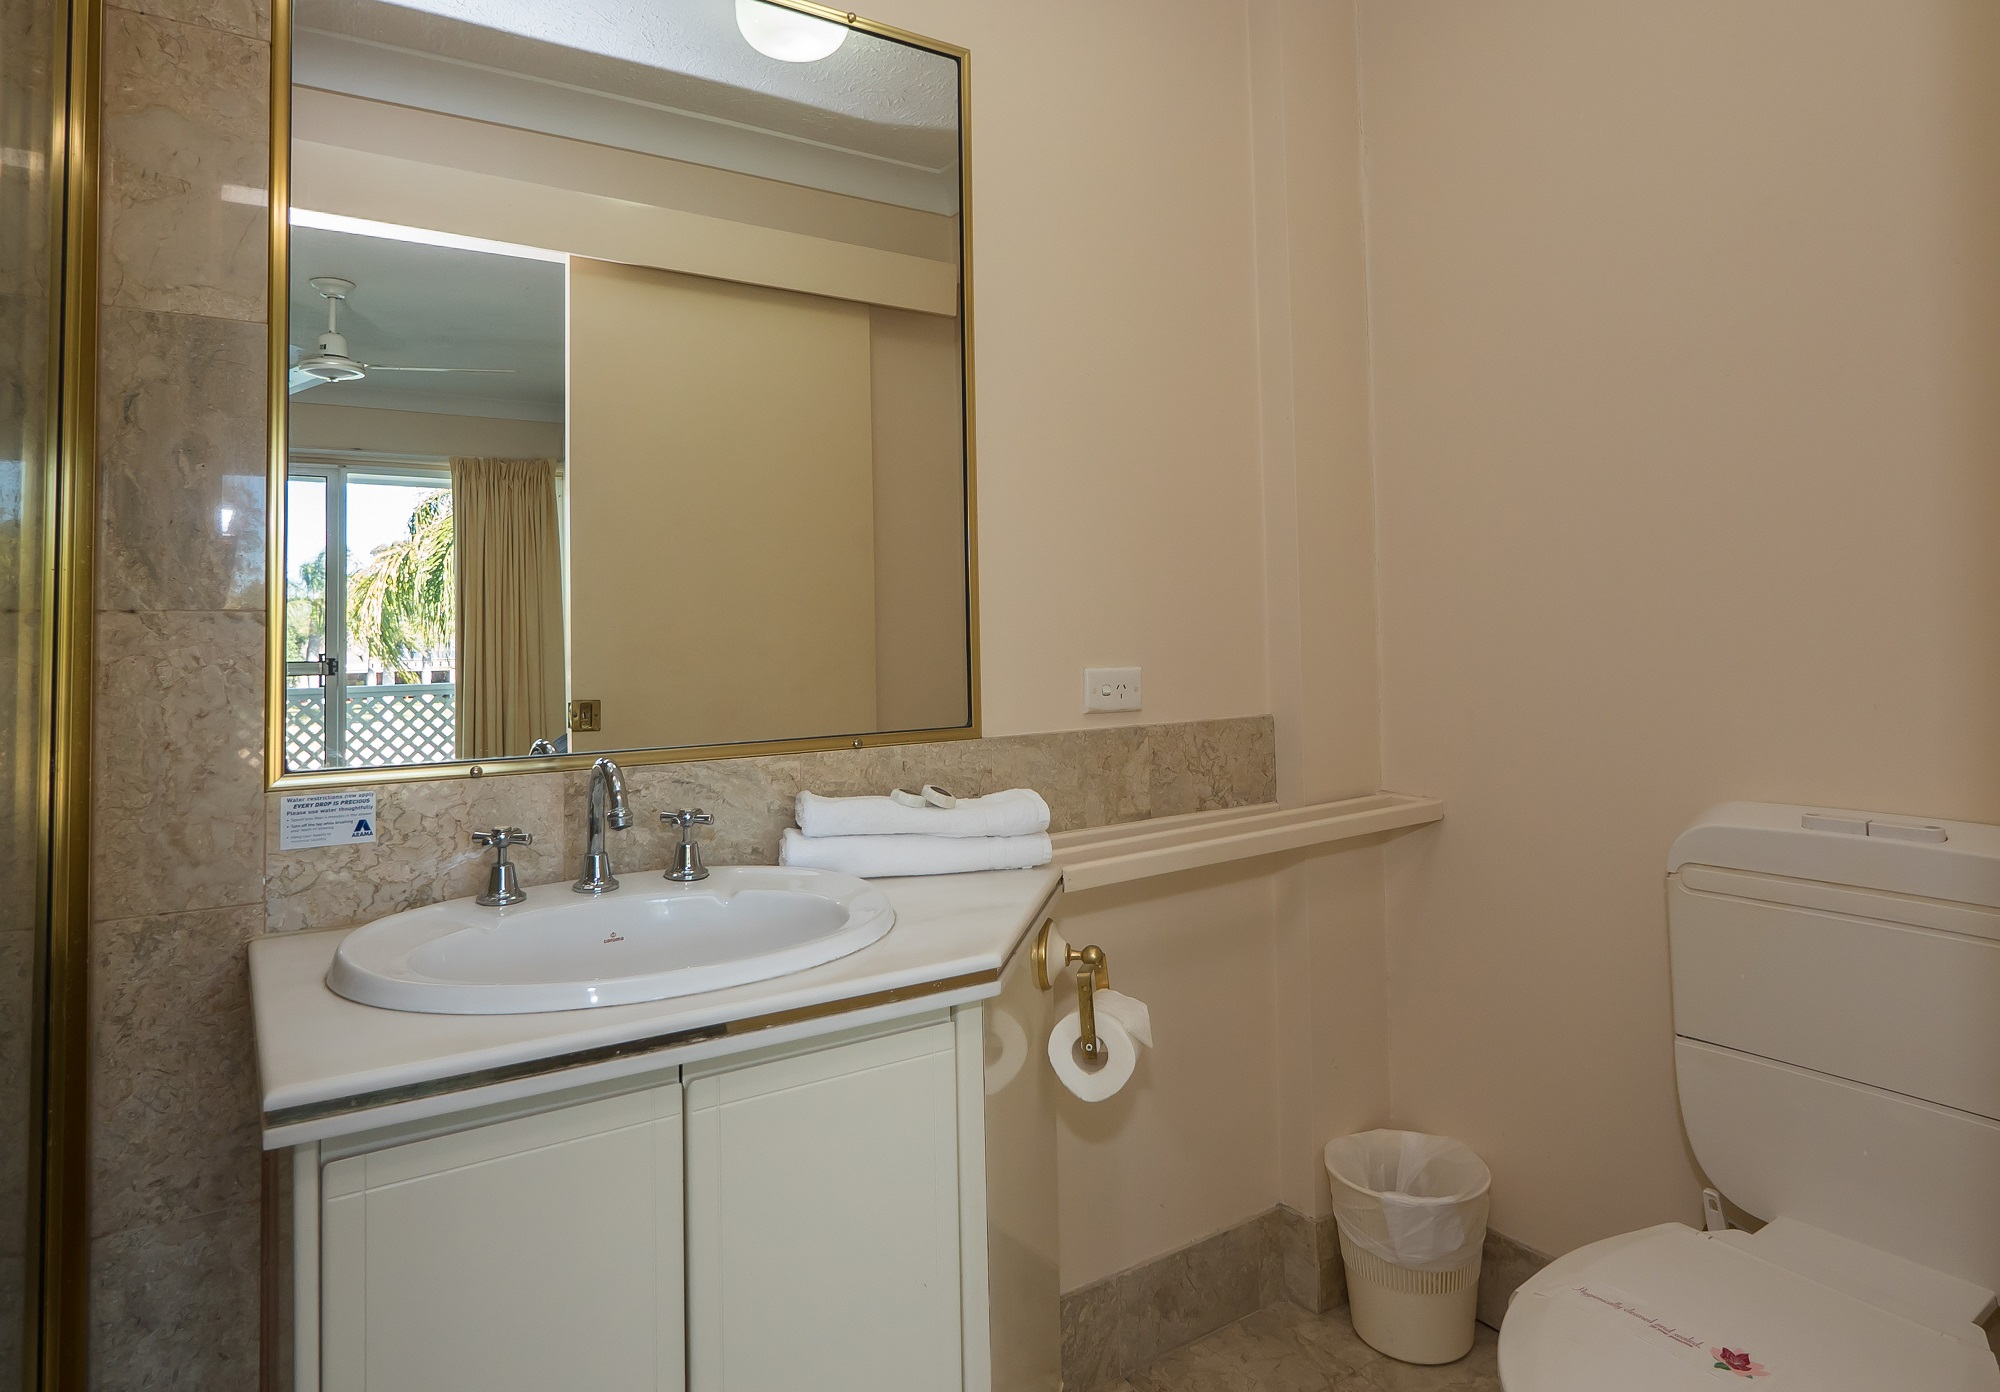 Isle of Palms Resort Accommodation - Bathroom